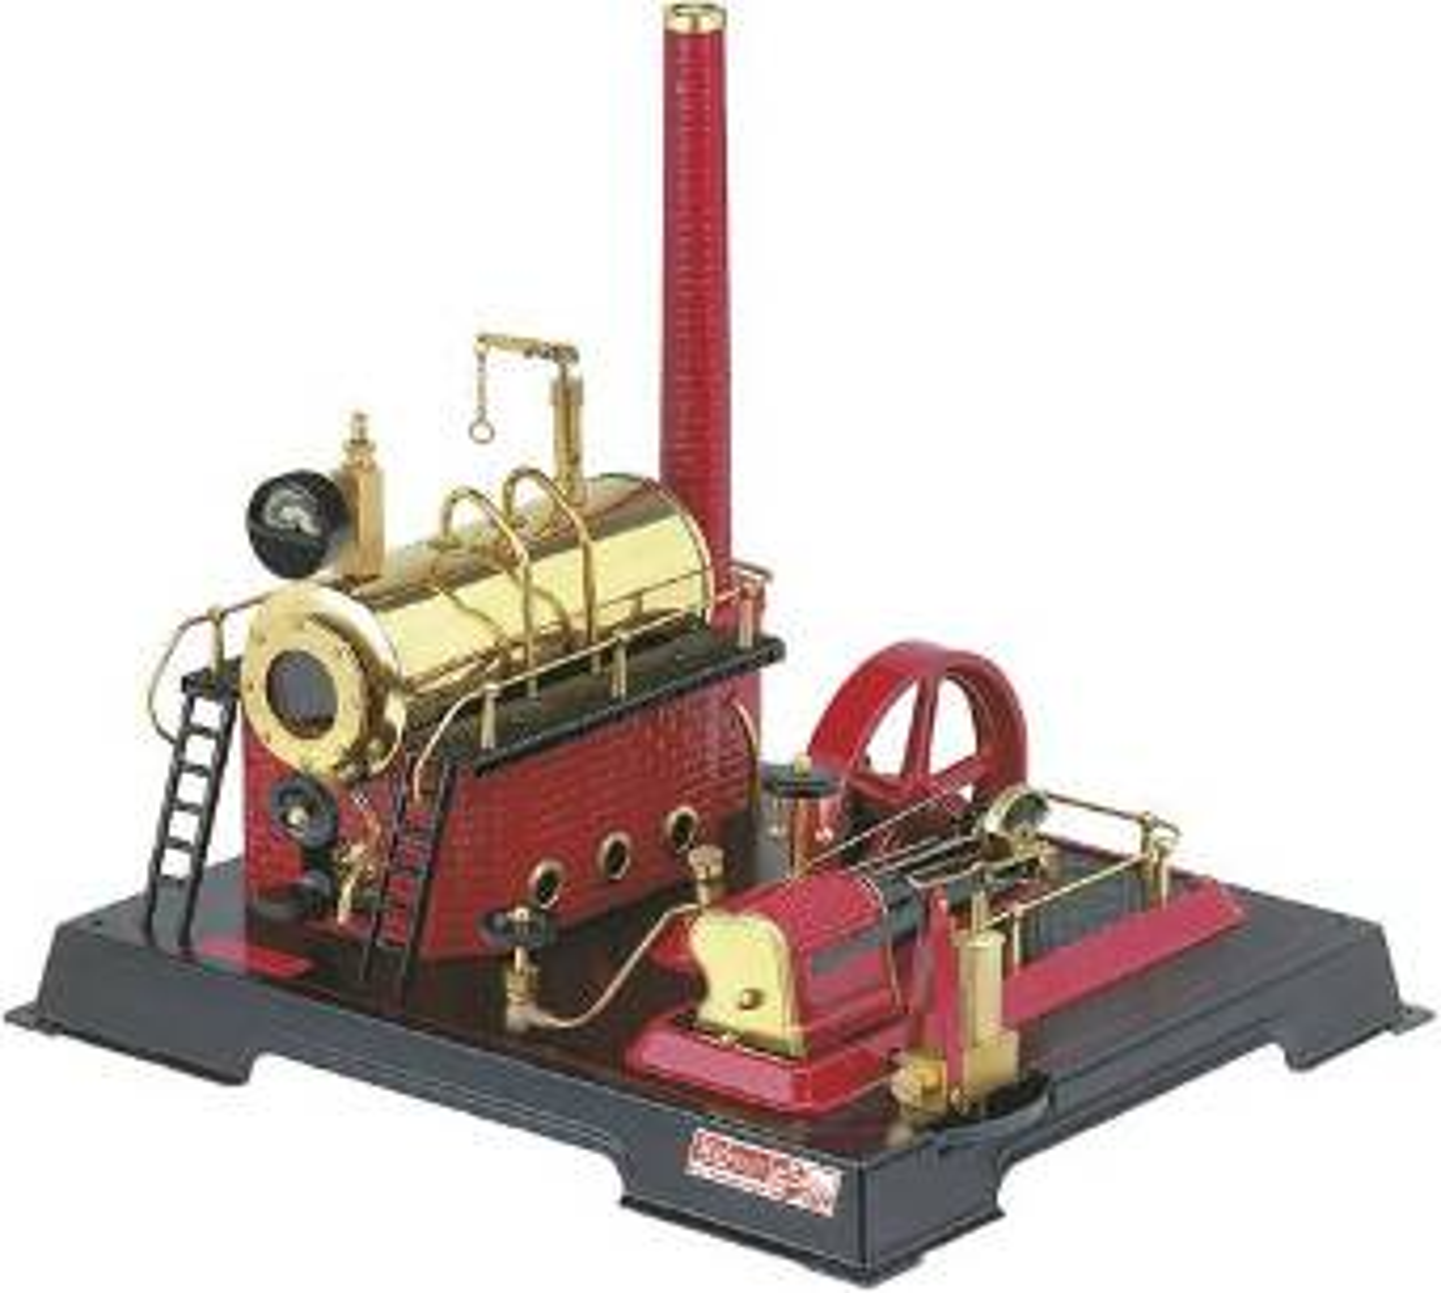 Modellbau-Dampfmaschine